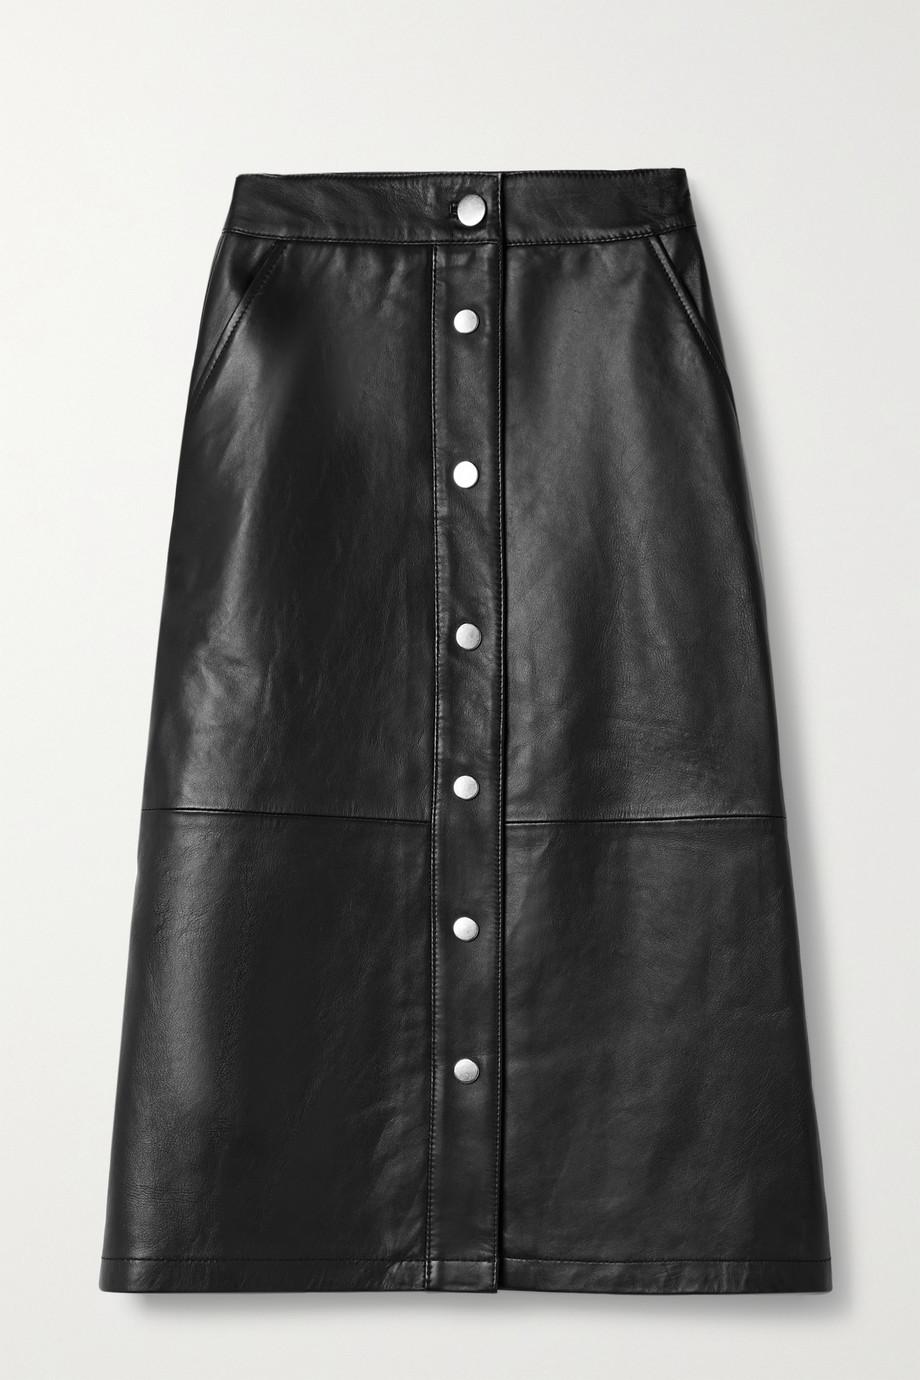 Deadwood Lara recycled leather skirt